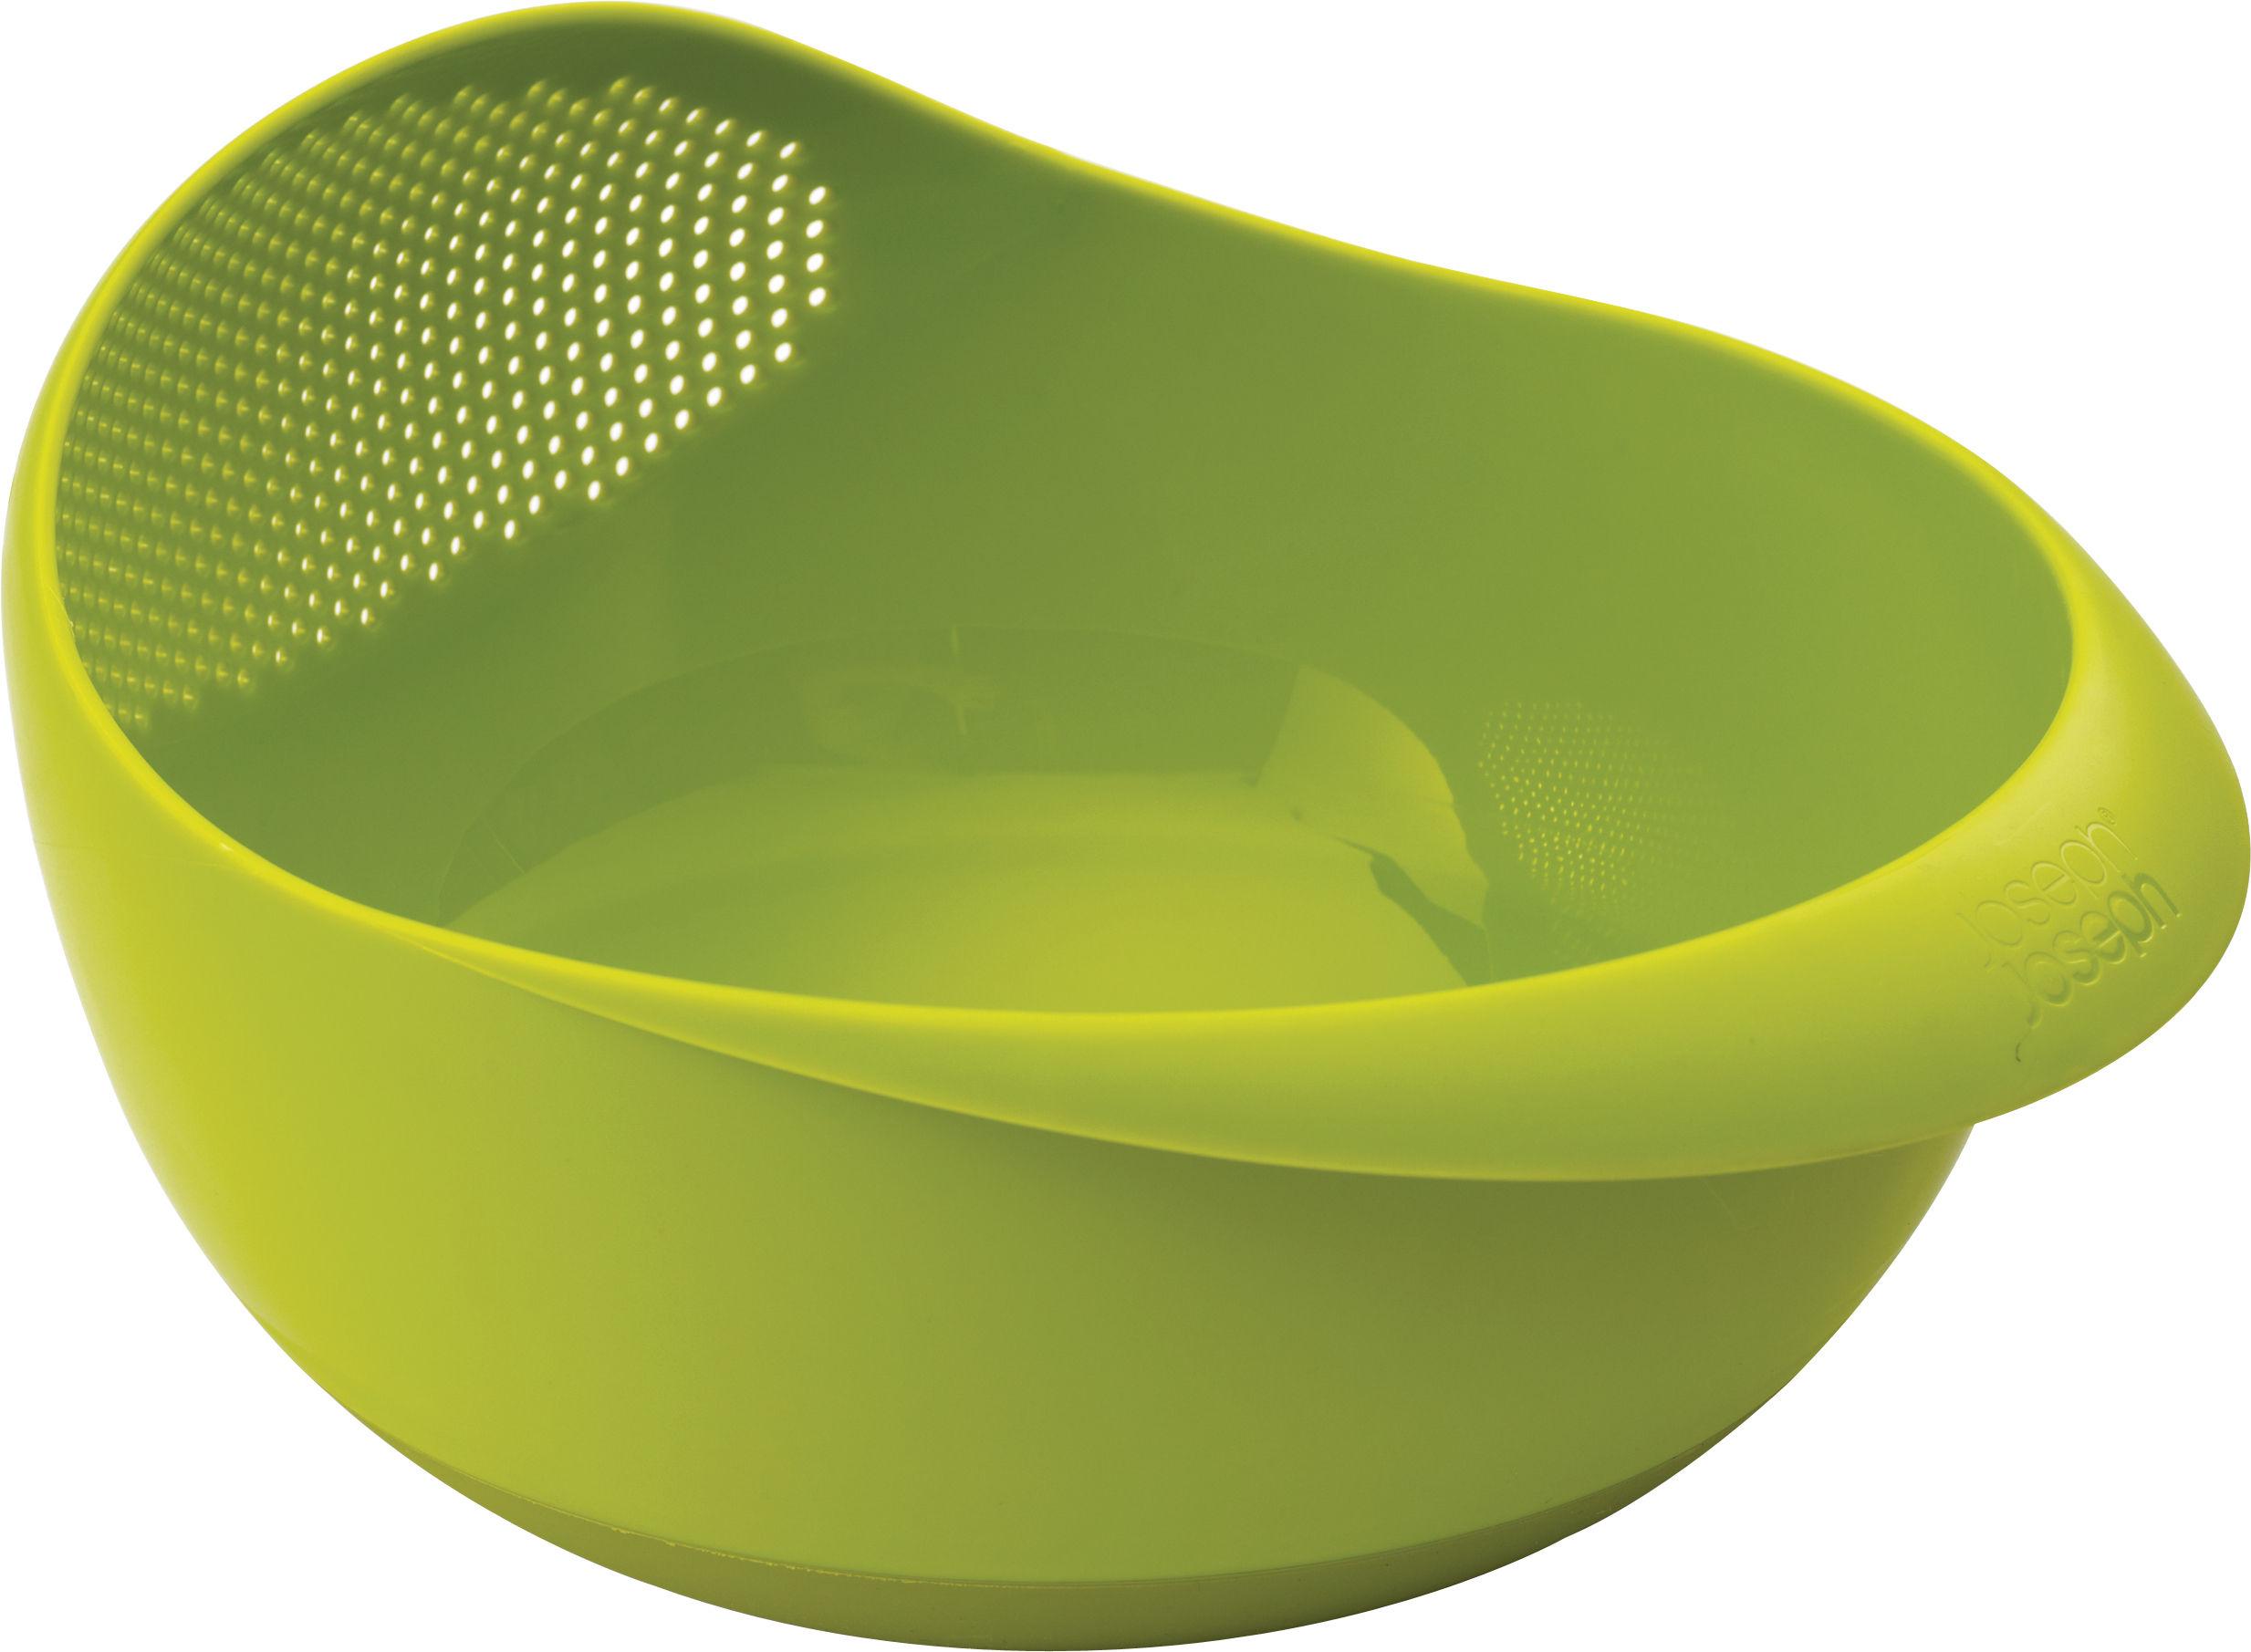 Tischkultur - Salatschüsseln und Schalen - Prep&Serve Salatschüssel / mit integriertem Sieb - Joseph Joseph - Grün - Polypropylen